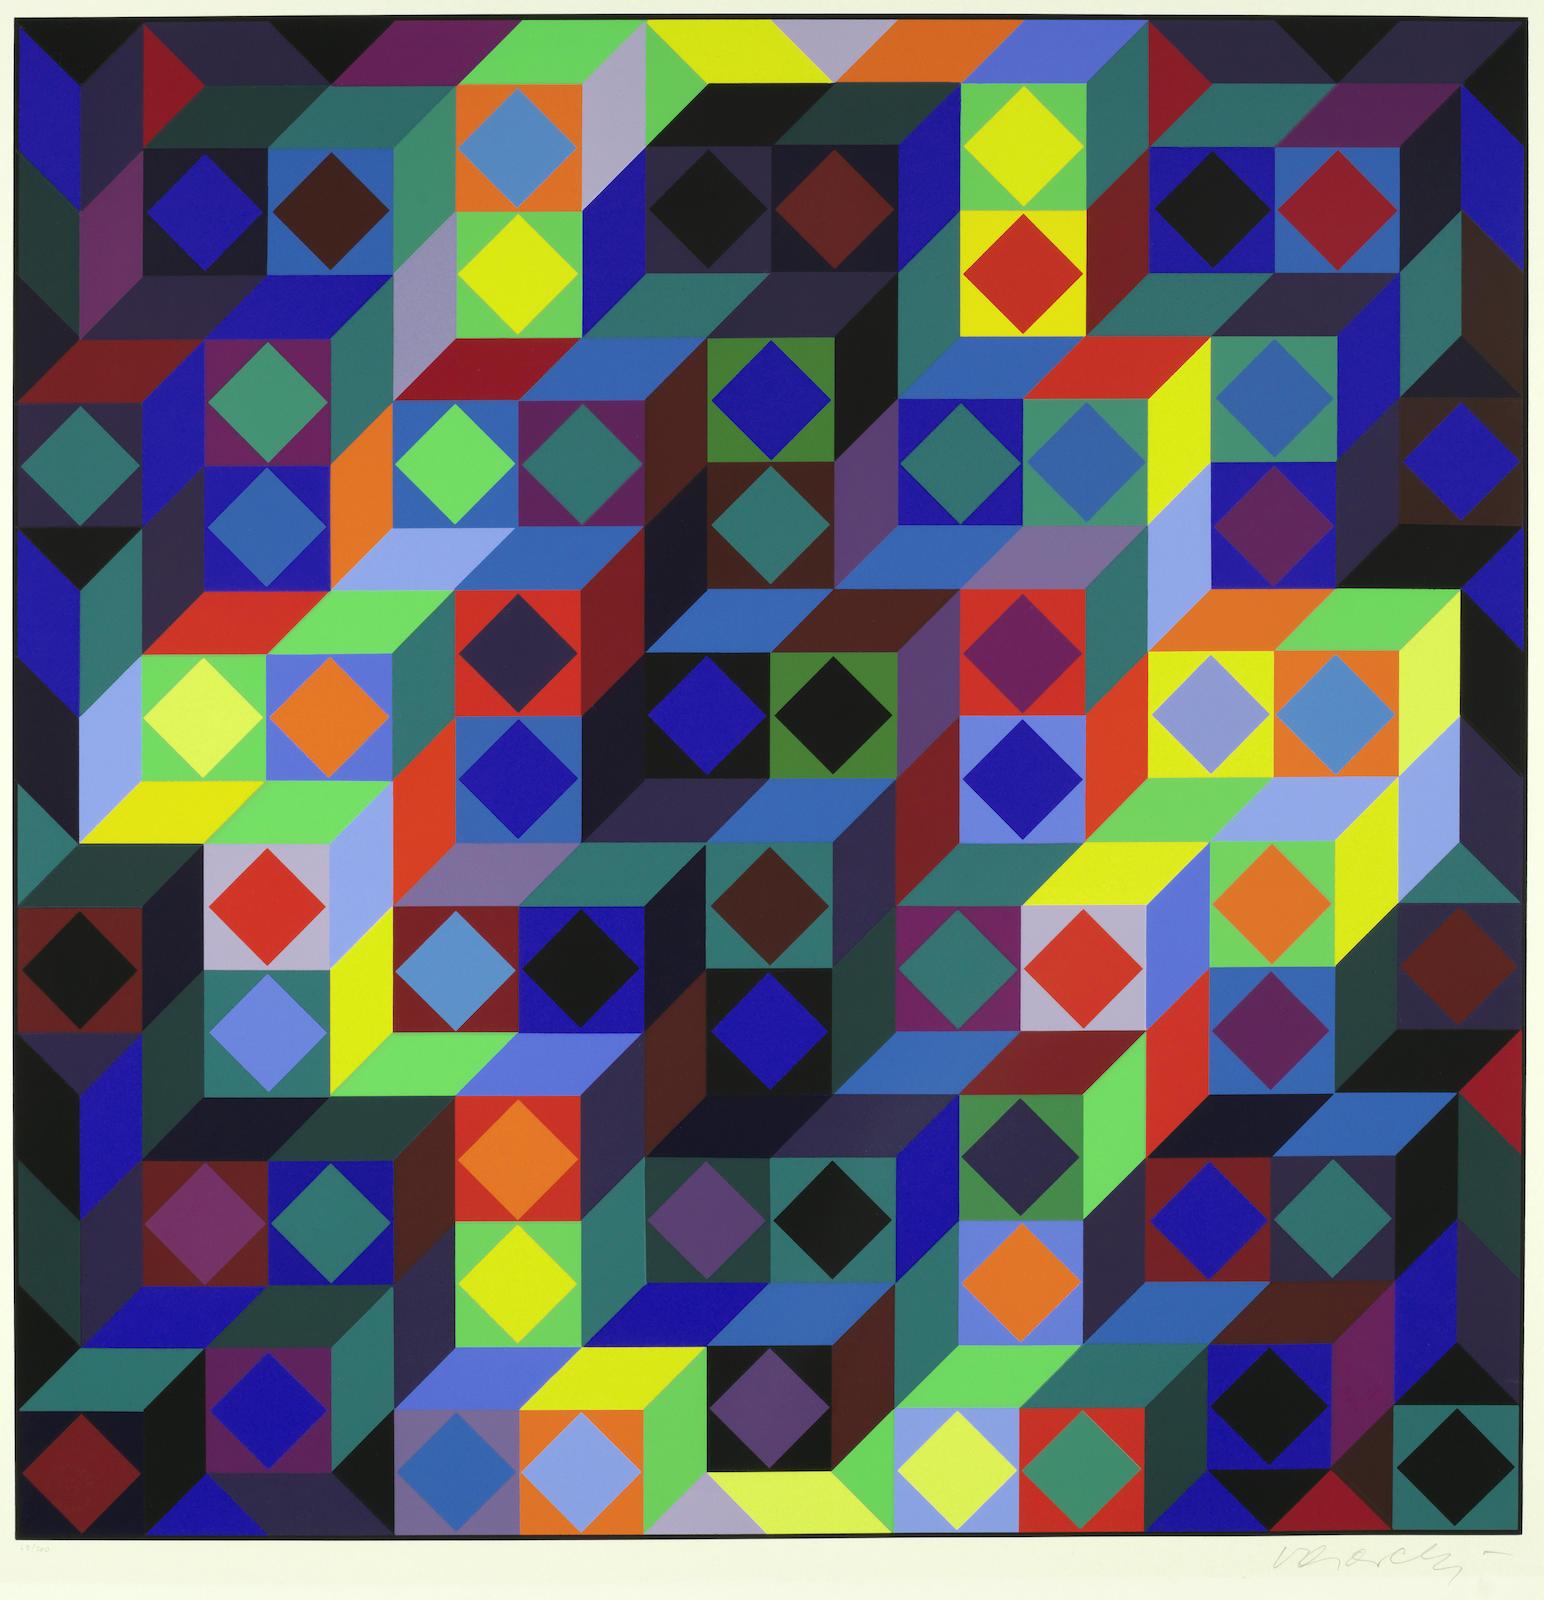 Victor Vasarely-Hommage a l'Hexagone VI; Zeta-1969